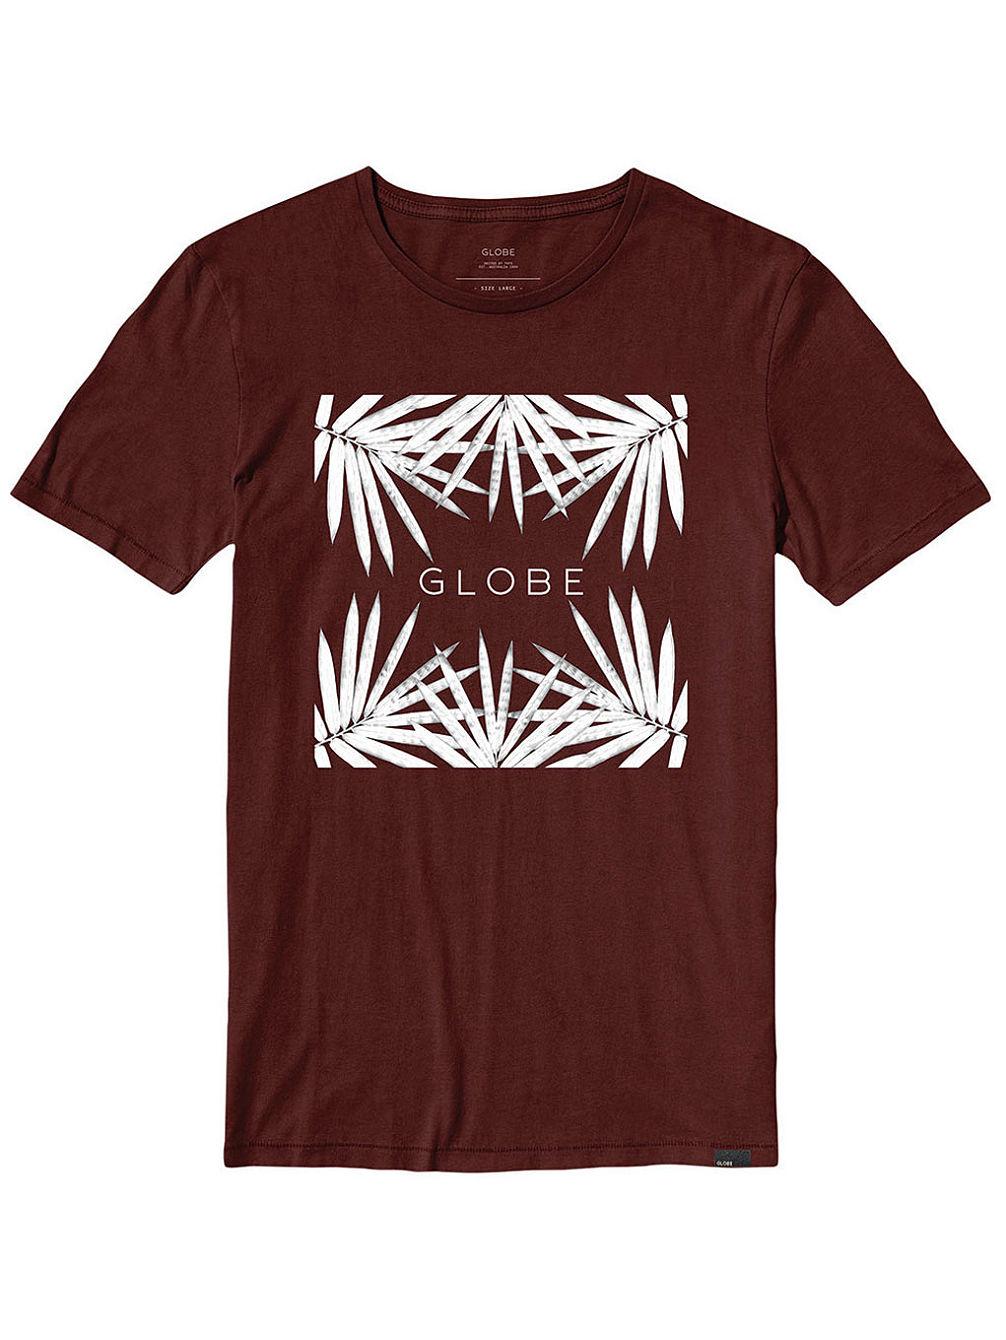 globe-cove-t-shirt